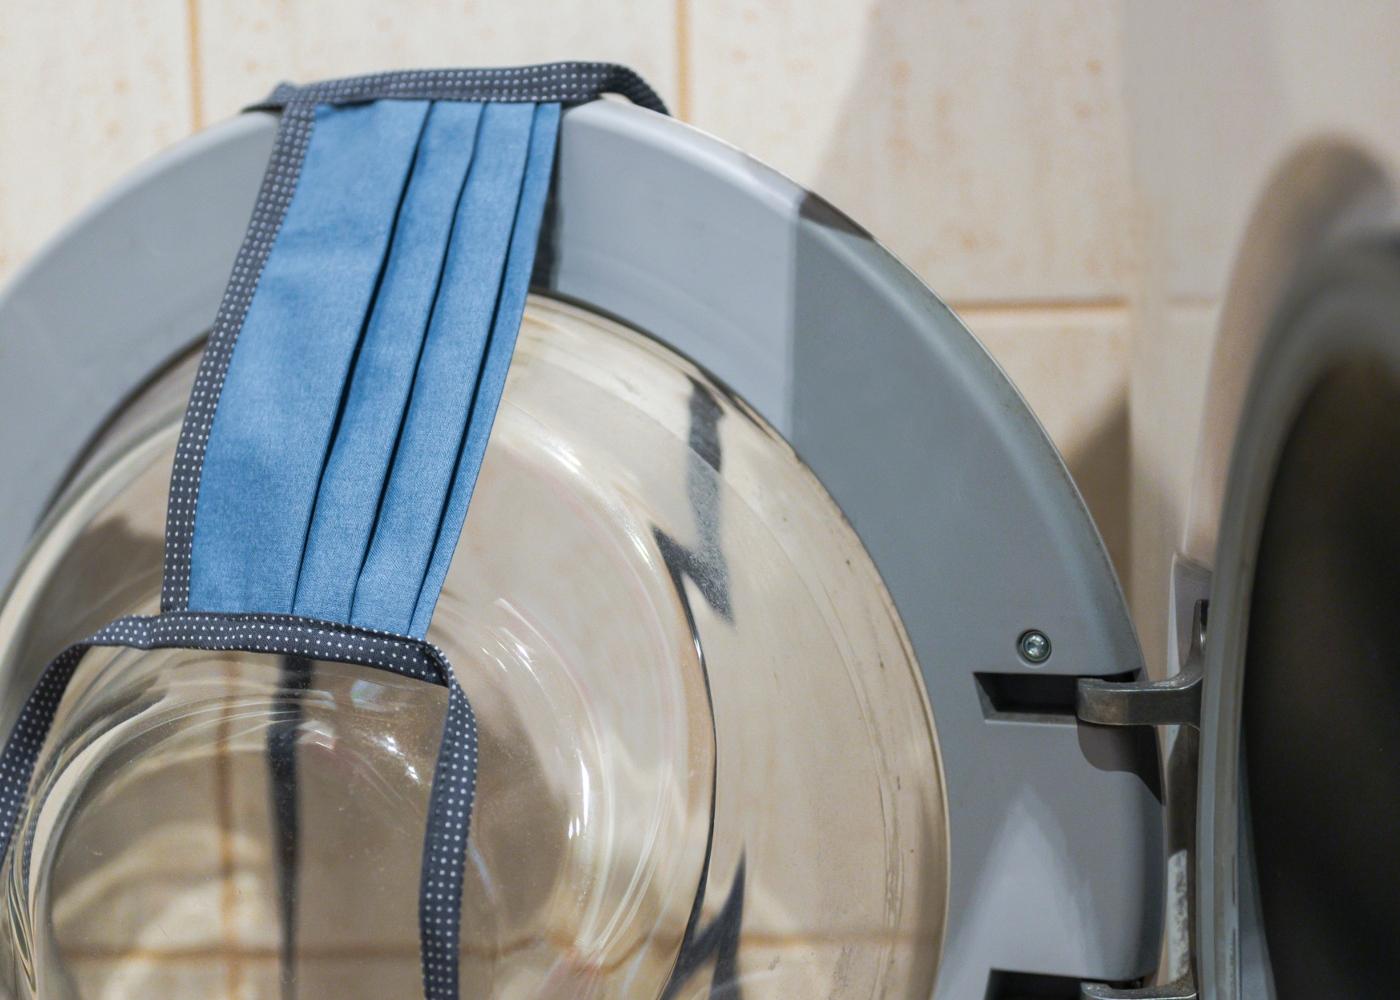 Máscara reutilizável na máquina de lavar roupa